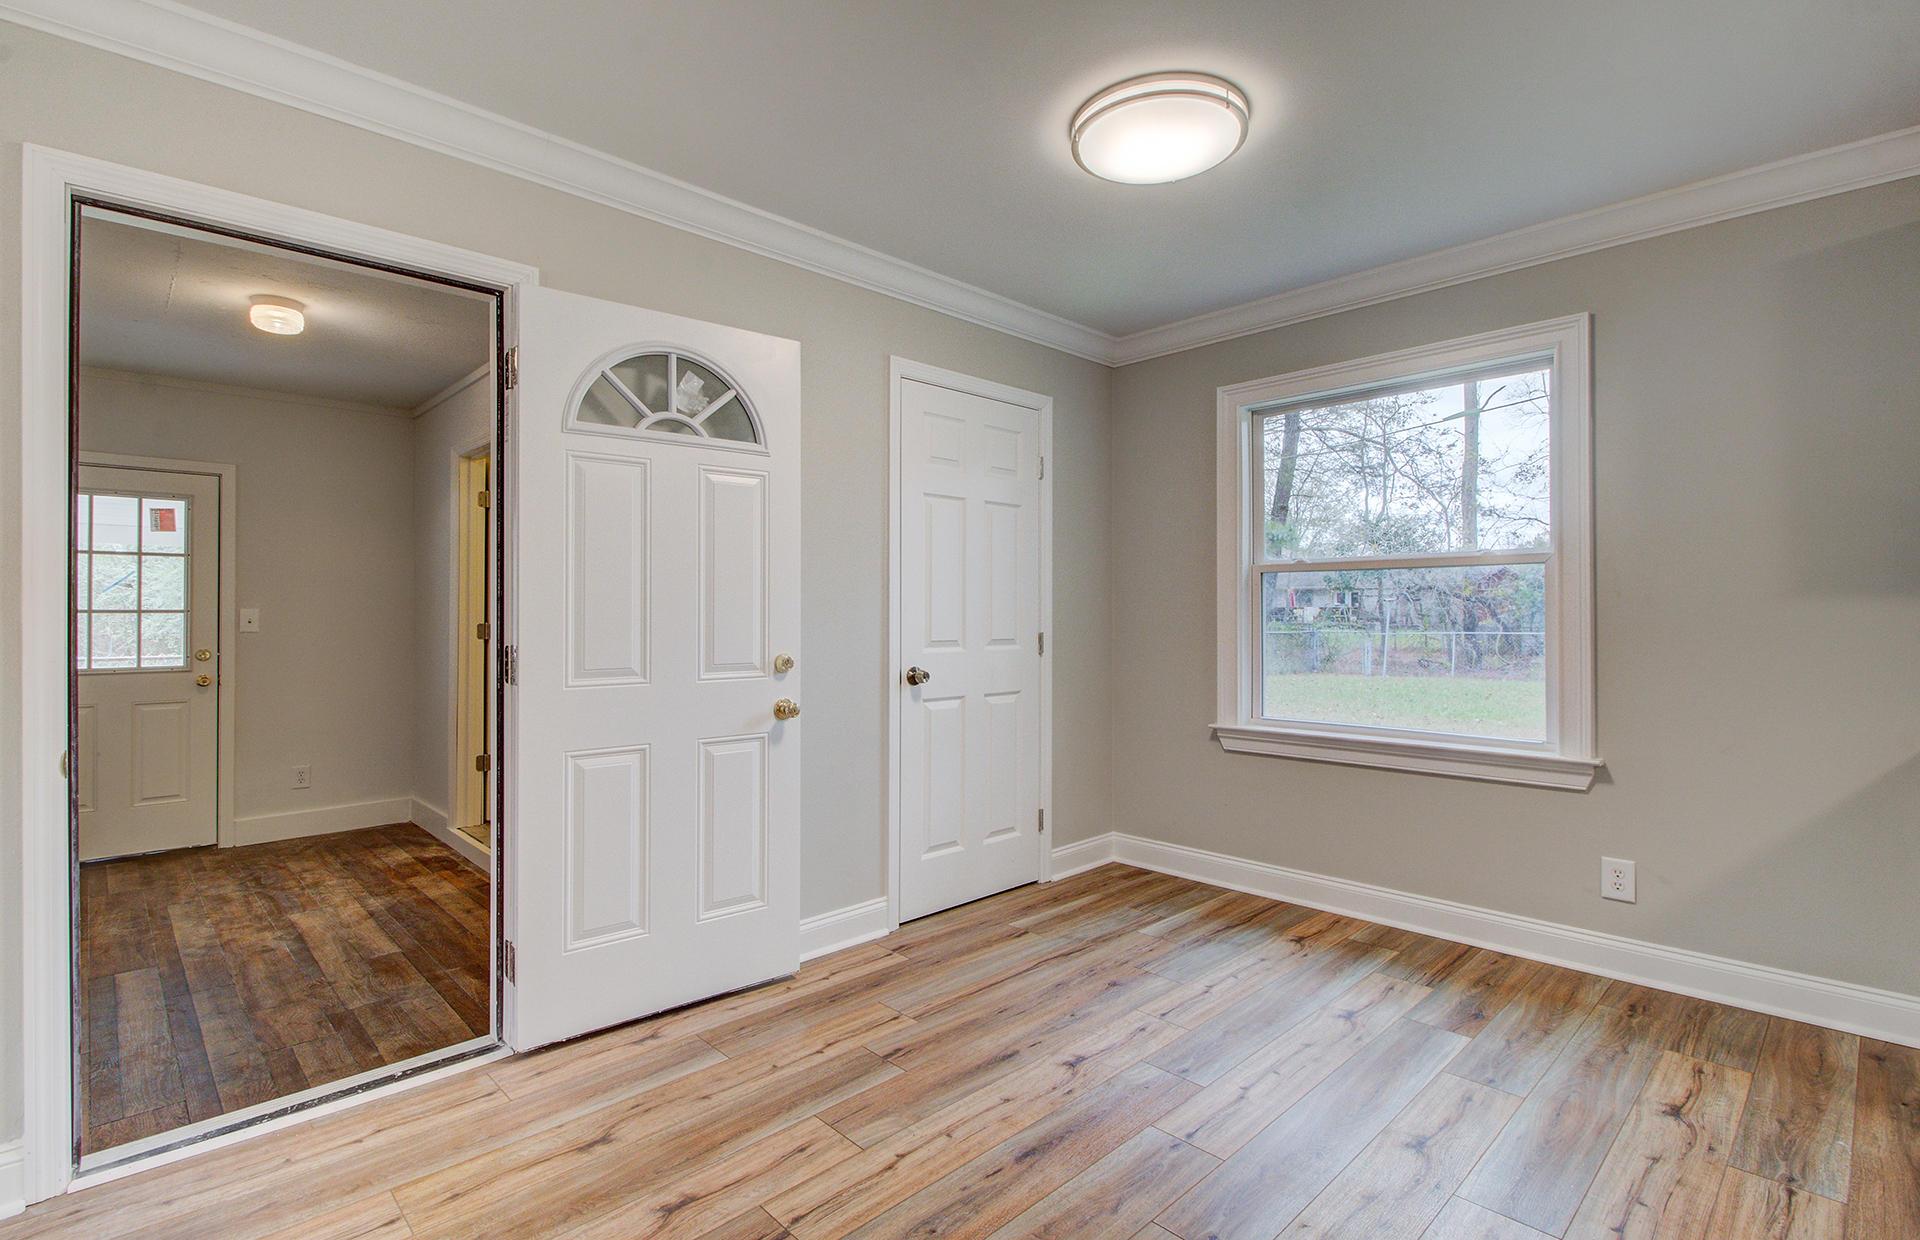 Sedgefield Section I Homes For Sale - 30 Aldene, Goose Creek, SC - 18